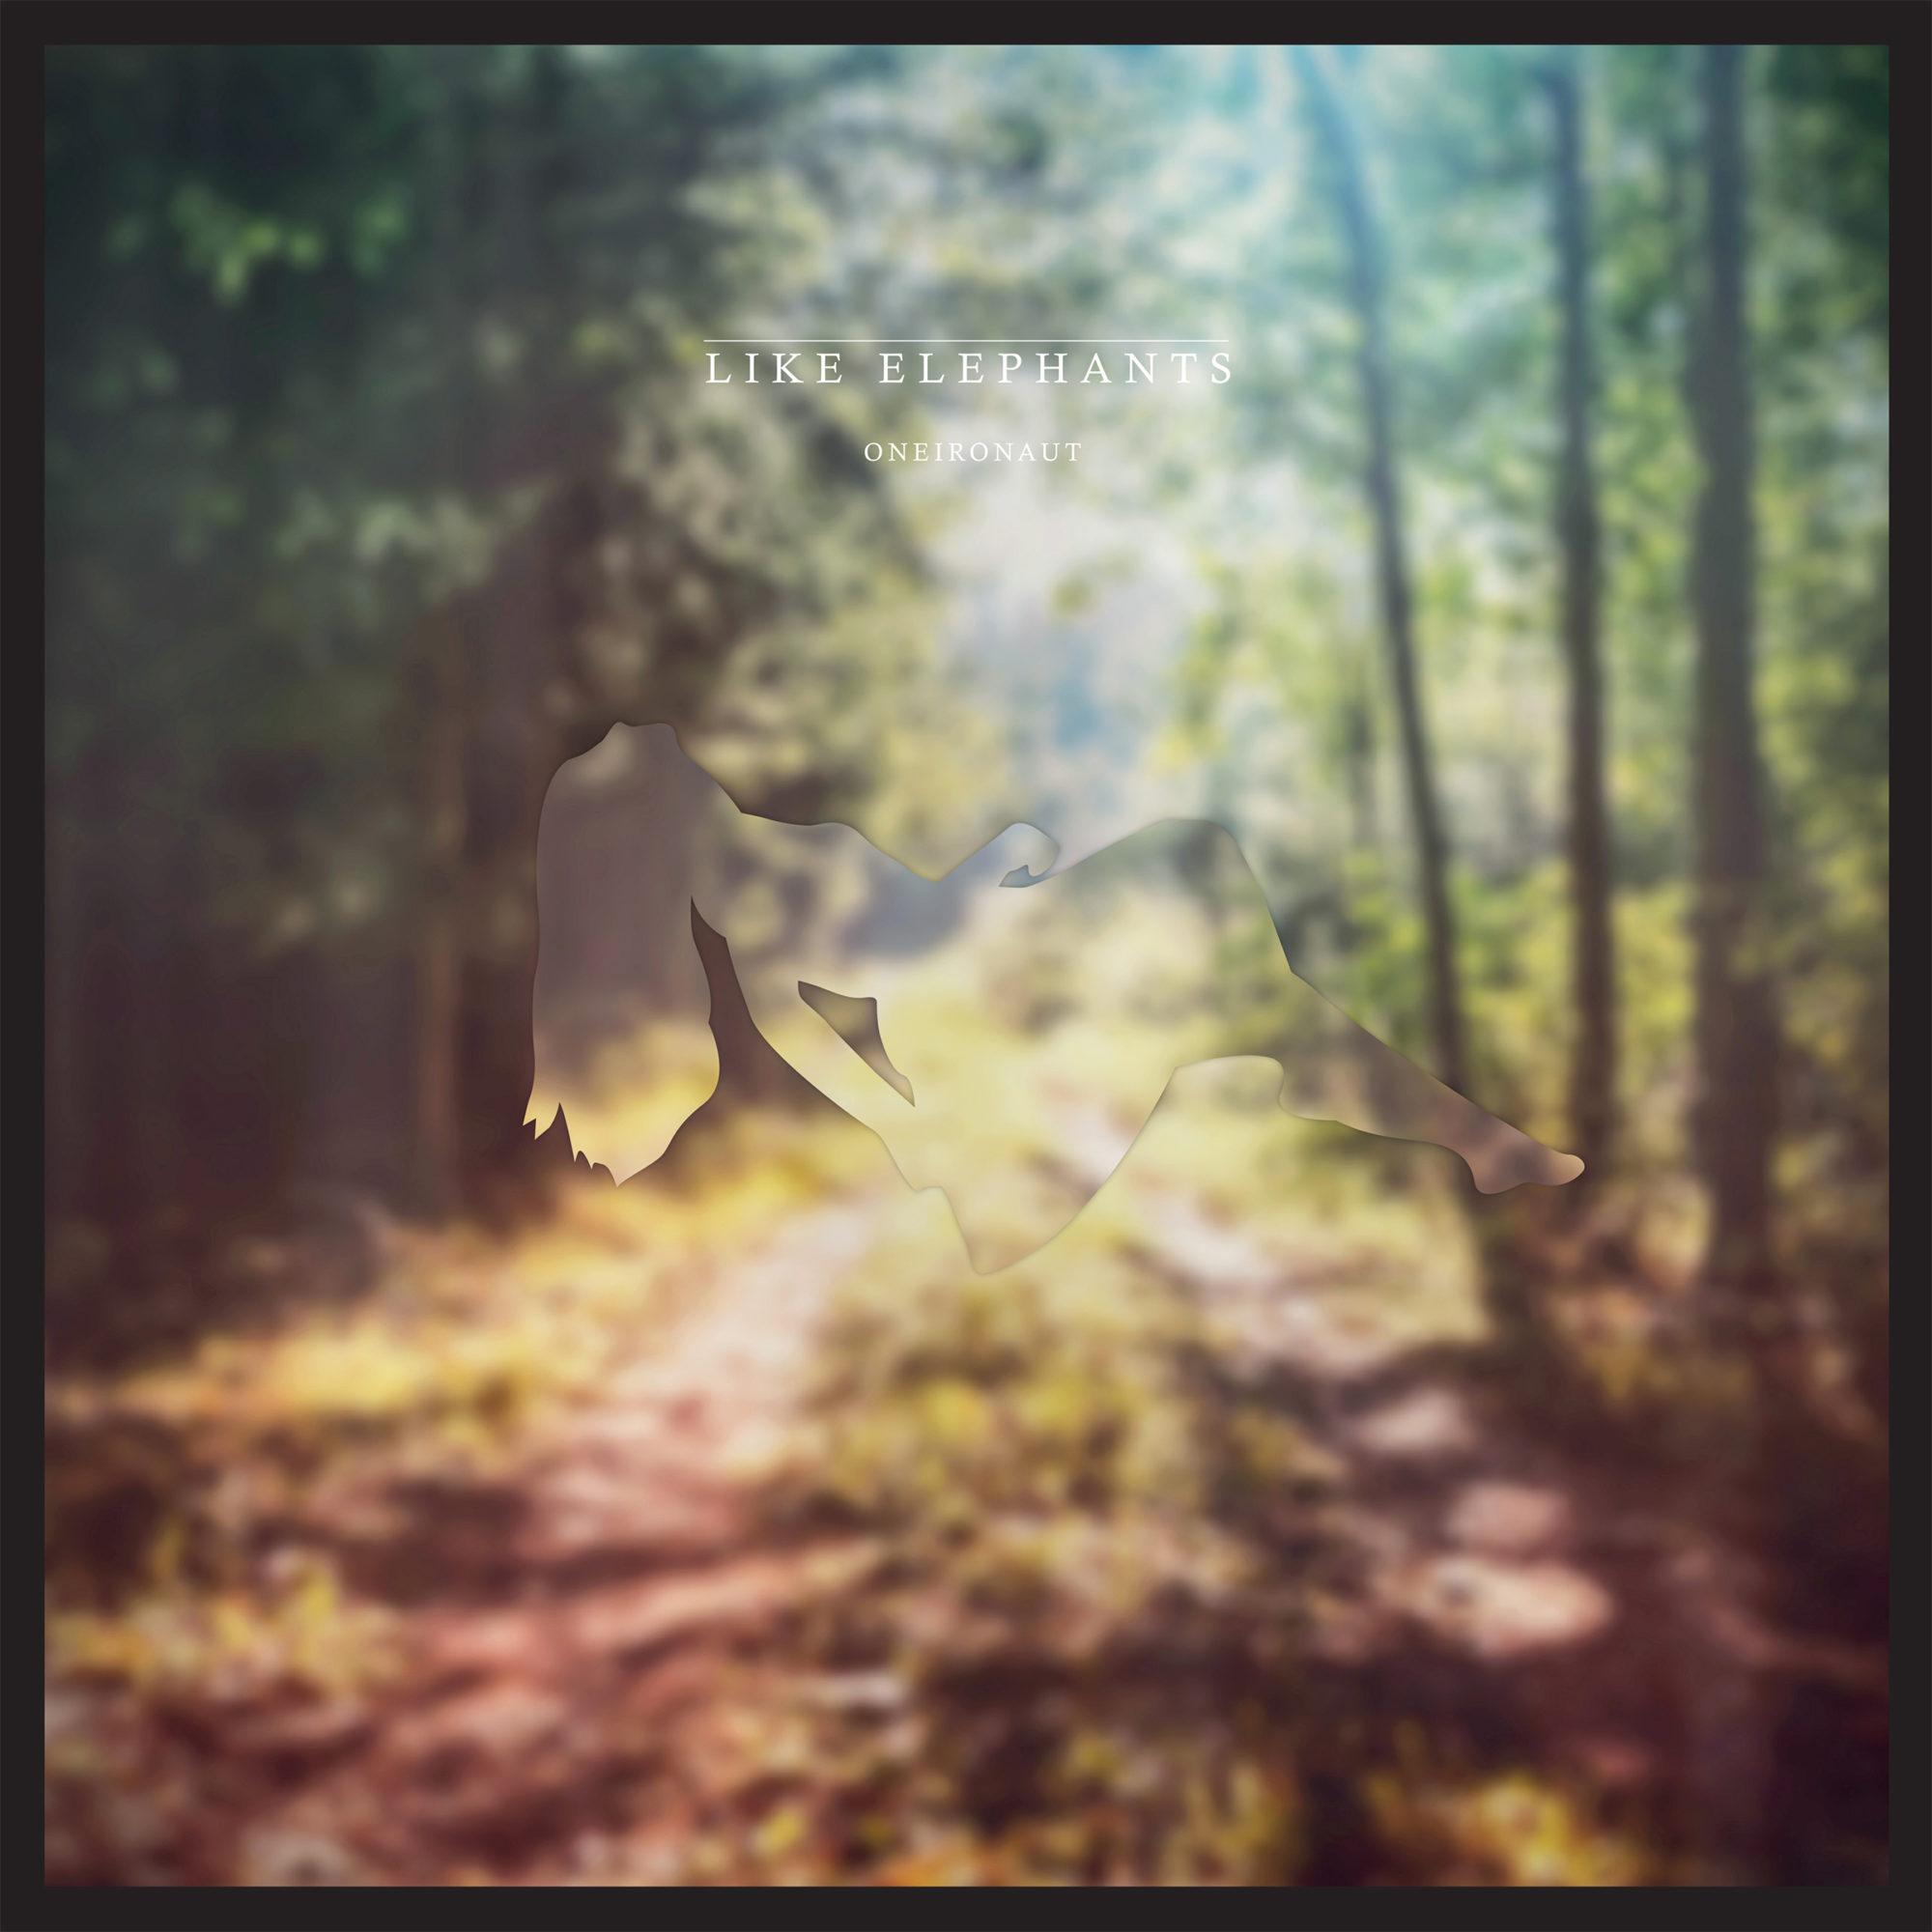 Like Elephants Band Oneironaut Album Vinyl Cover Artwork Music Austria